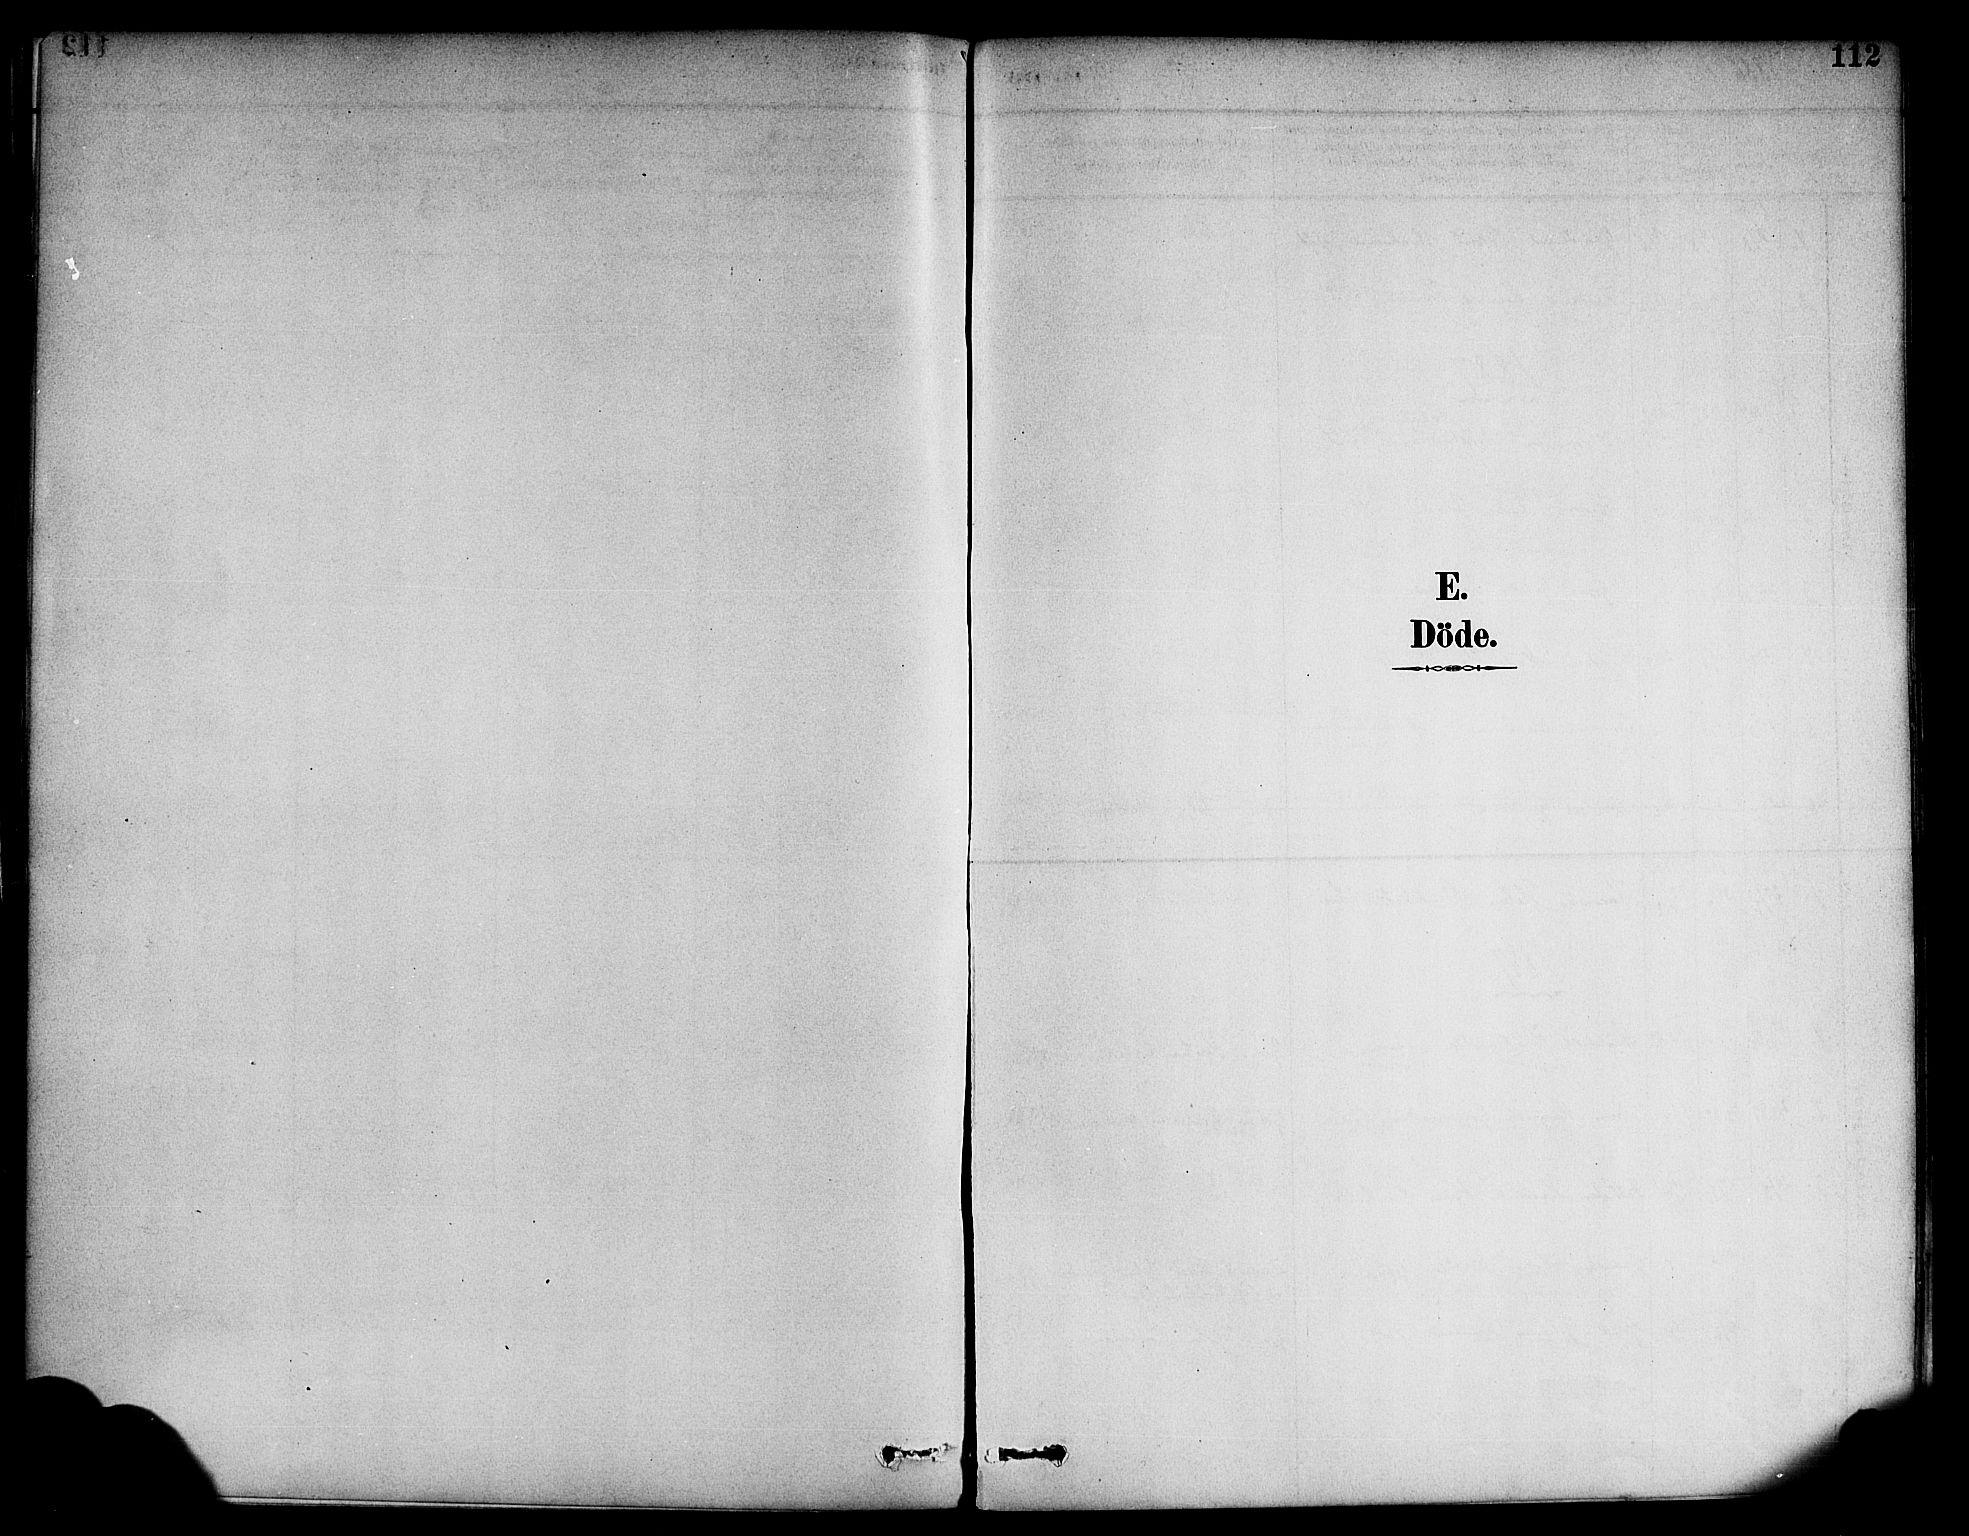 SAB, Hyllestad Sokneprestembete, Ministerialbok nr. D 1, 1886-1905, s. 112